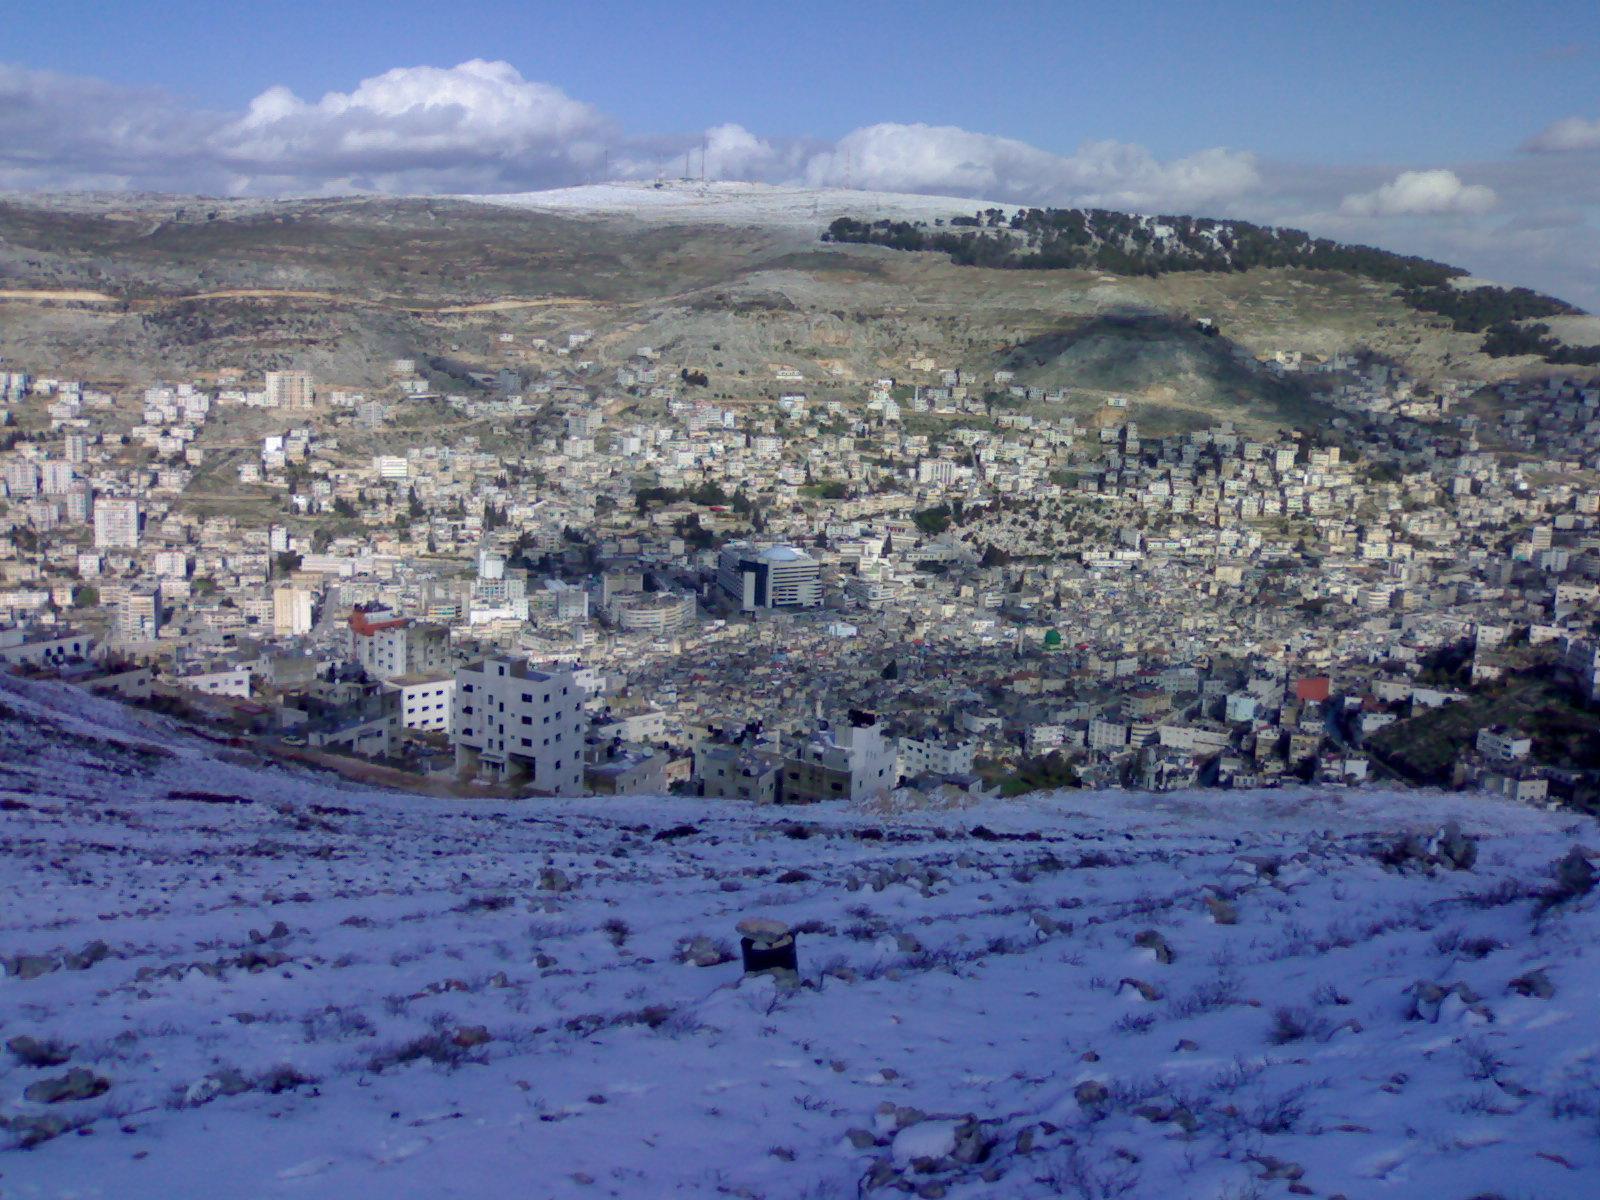 Nablus-Nablus: منظر عام /24391 - Palestine Remembered